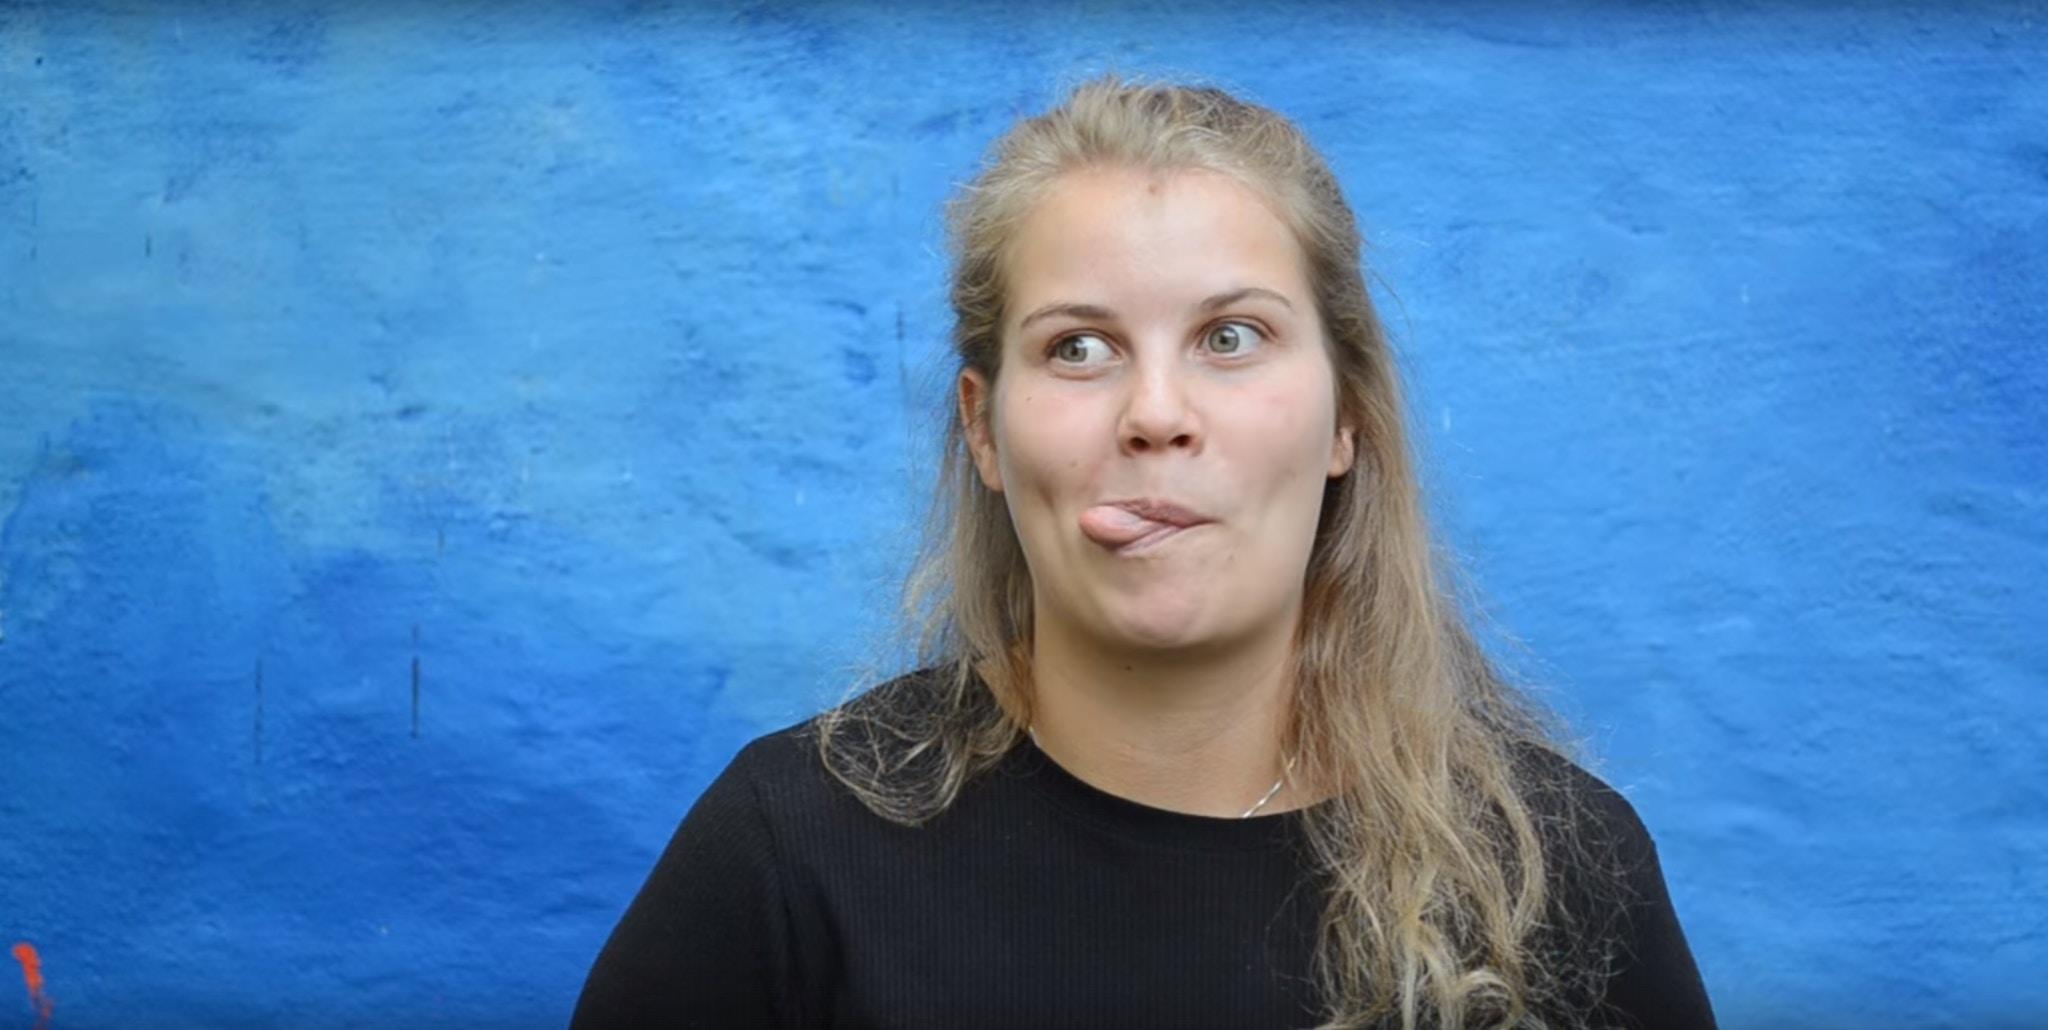 Sandra-thumb-engasjer-deg